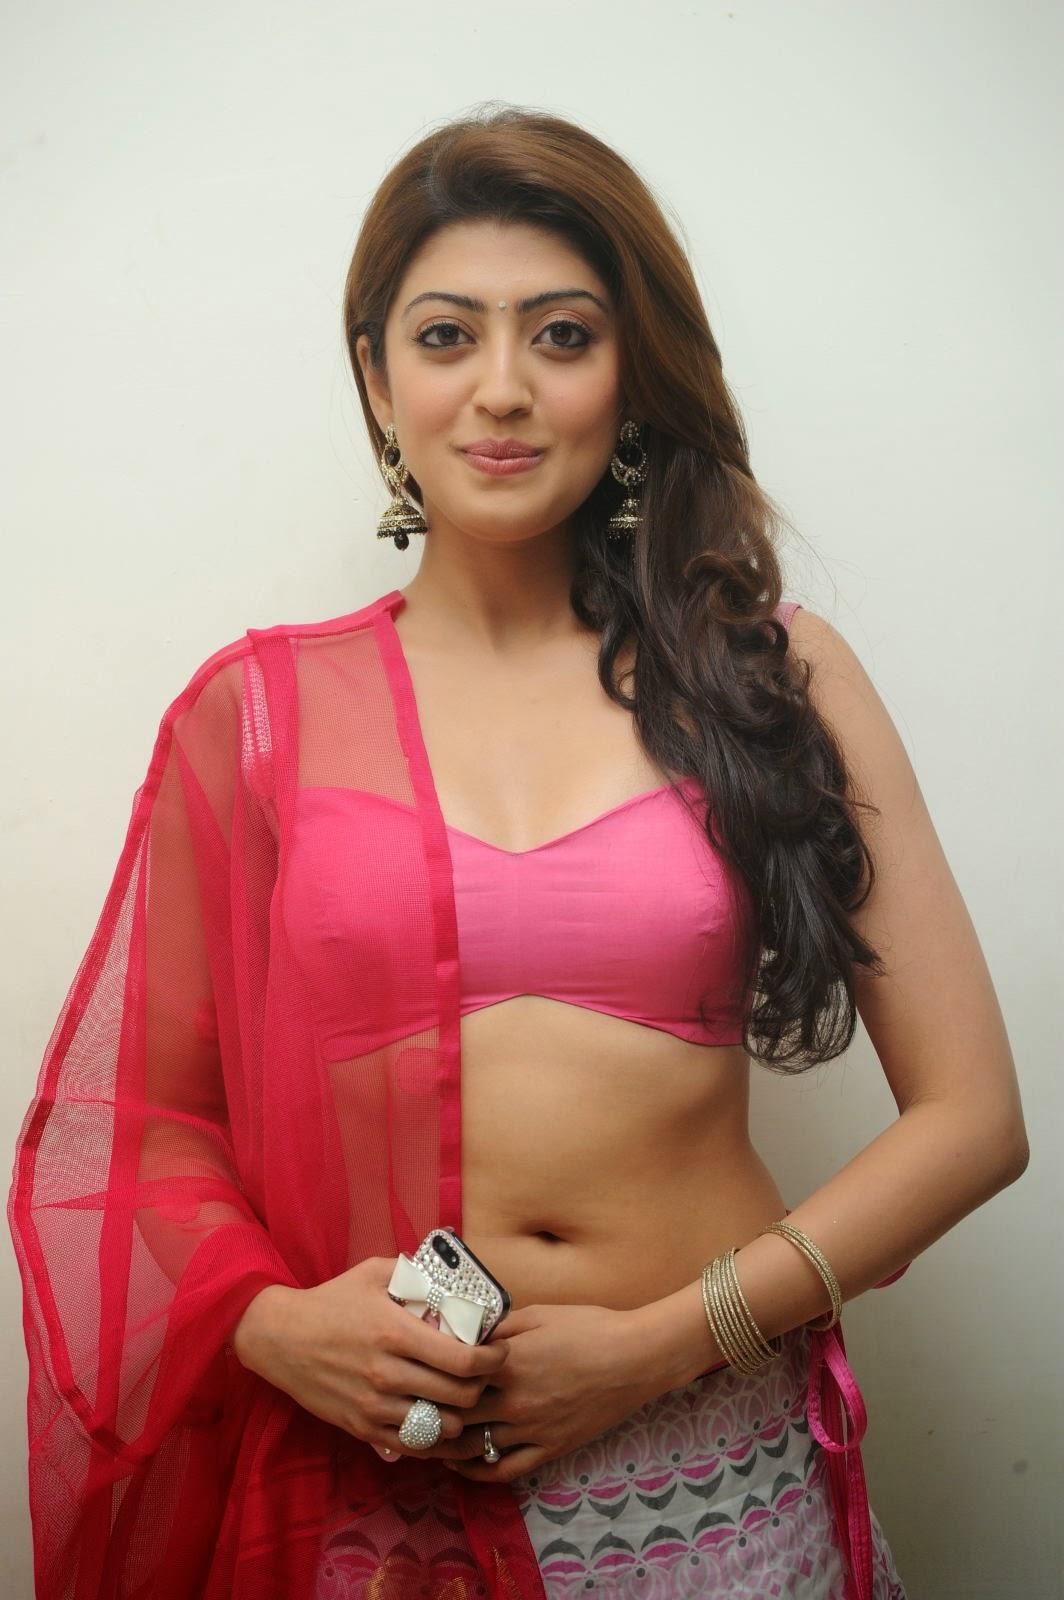 Pranitha Subhash Hot Sexy Navel In Pink Transparent Dress Celebs Hot World Hq No Watermark